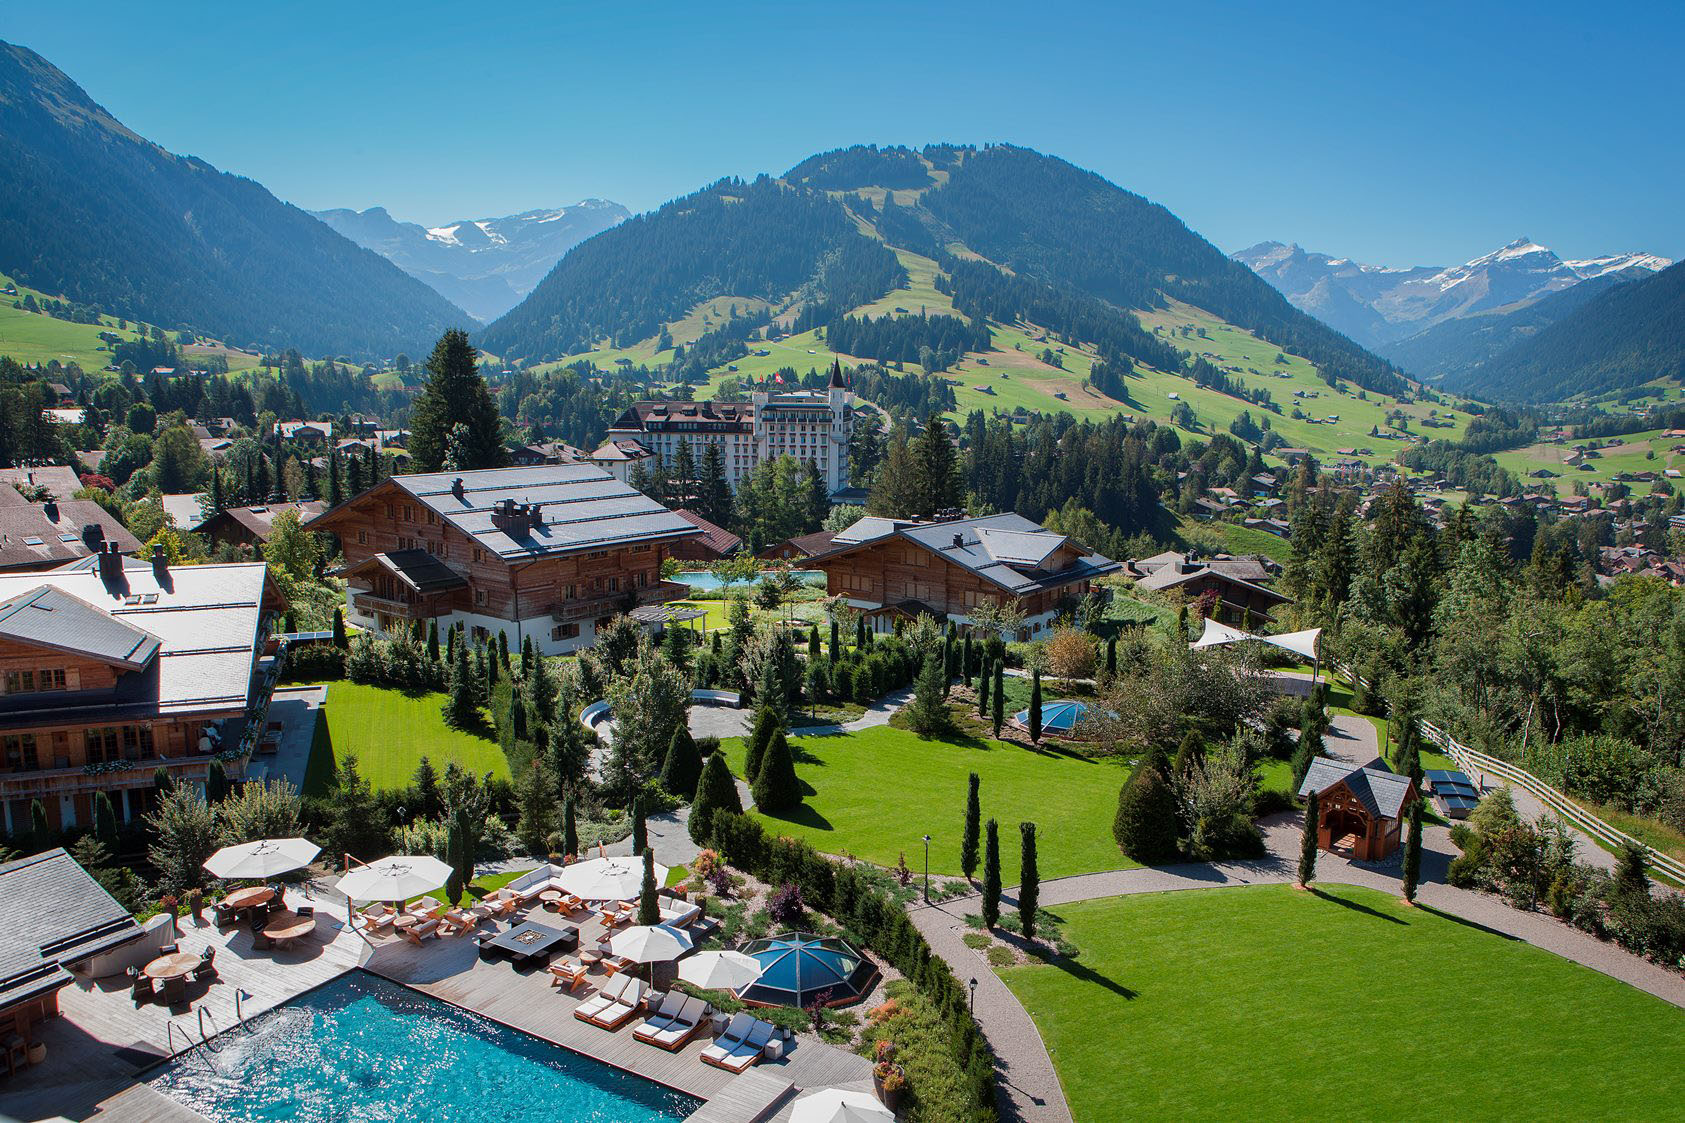 alpina-gstaad-hotel-switzerland-l-8672a9c39583609f